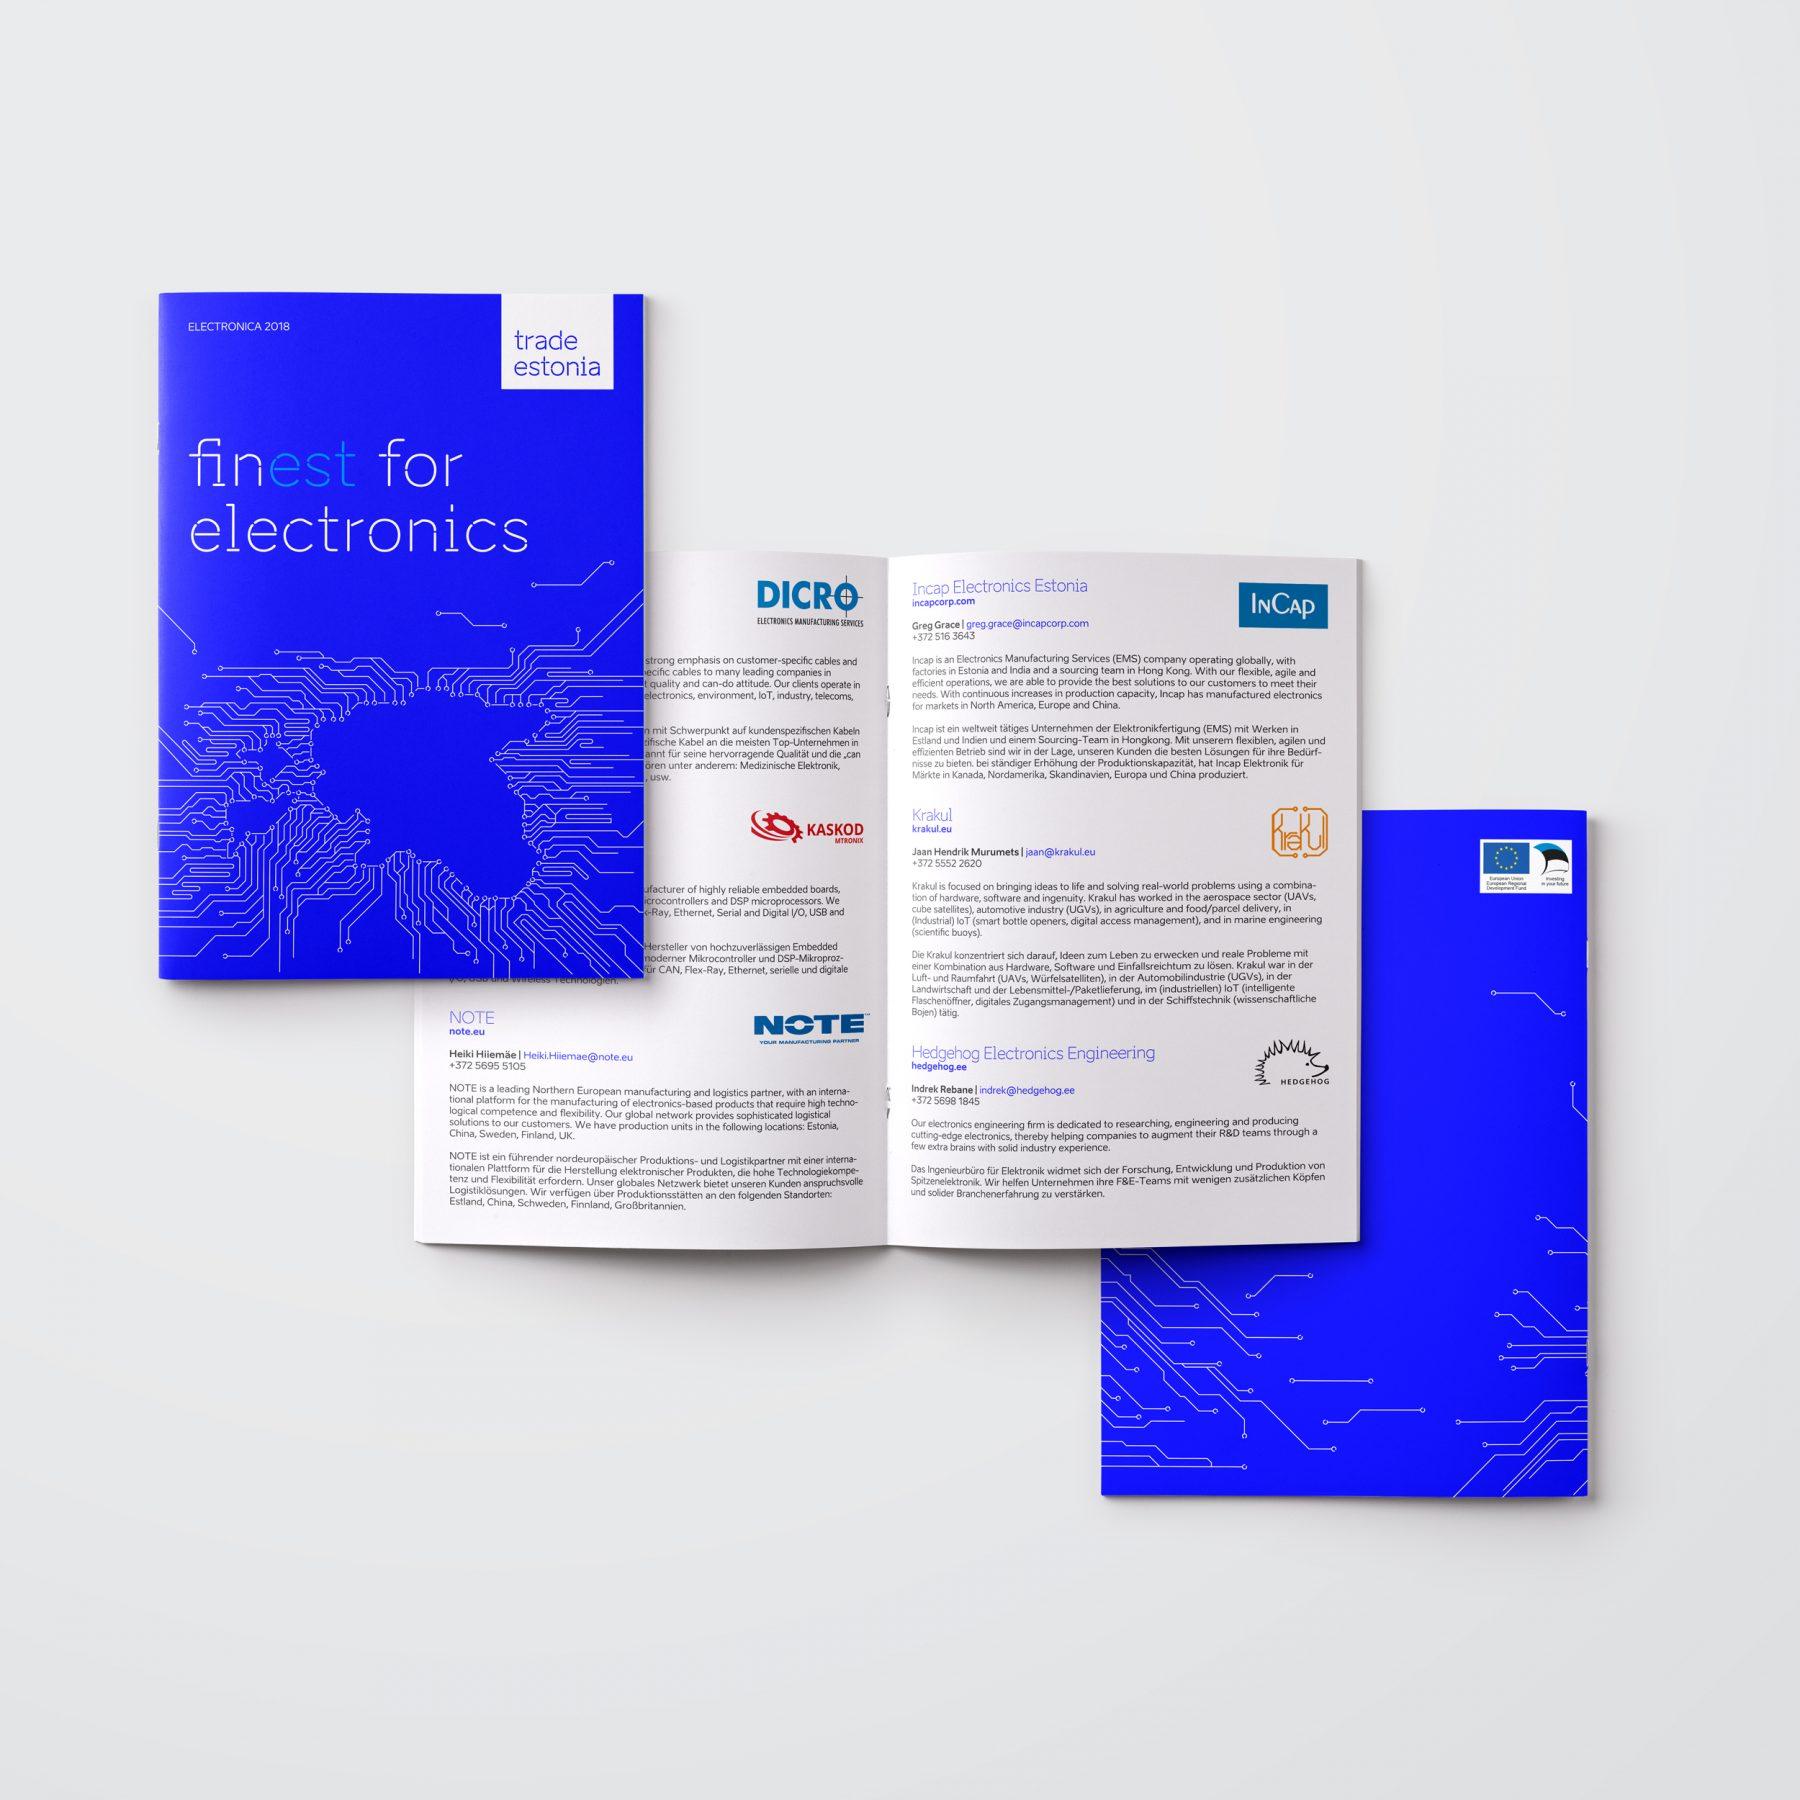 EAS_Electronica2018_A5_Mockup-1800×1800-1